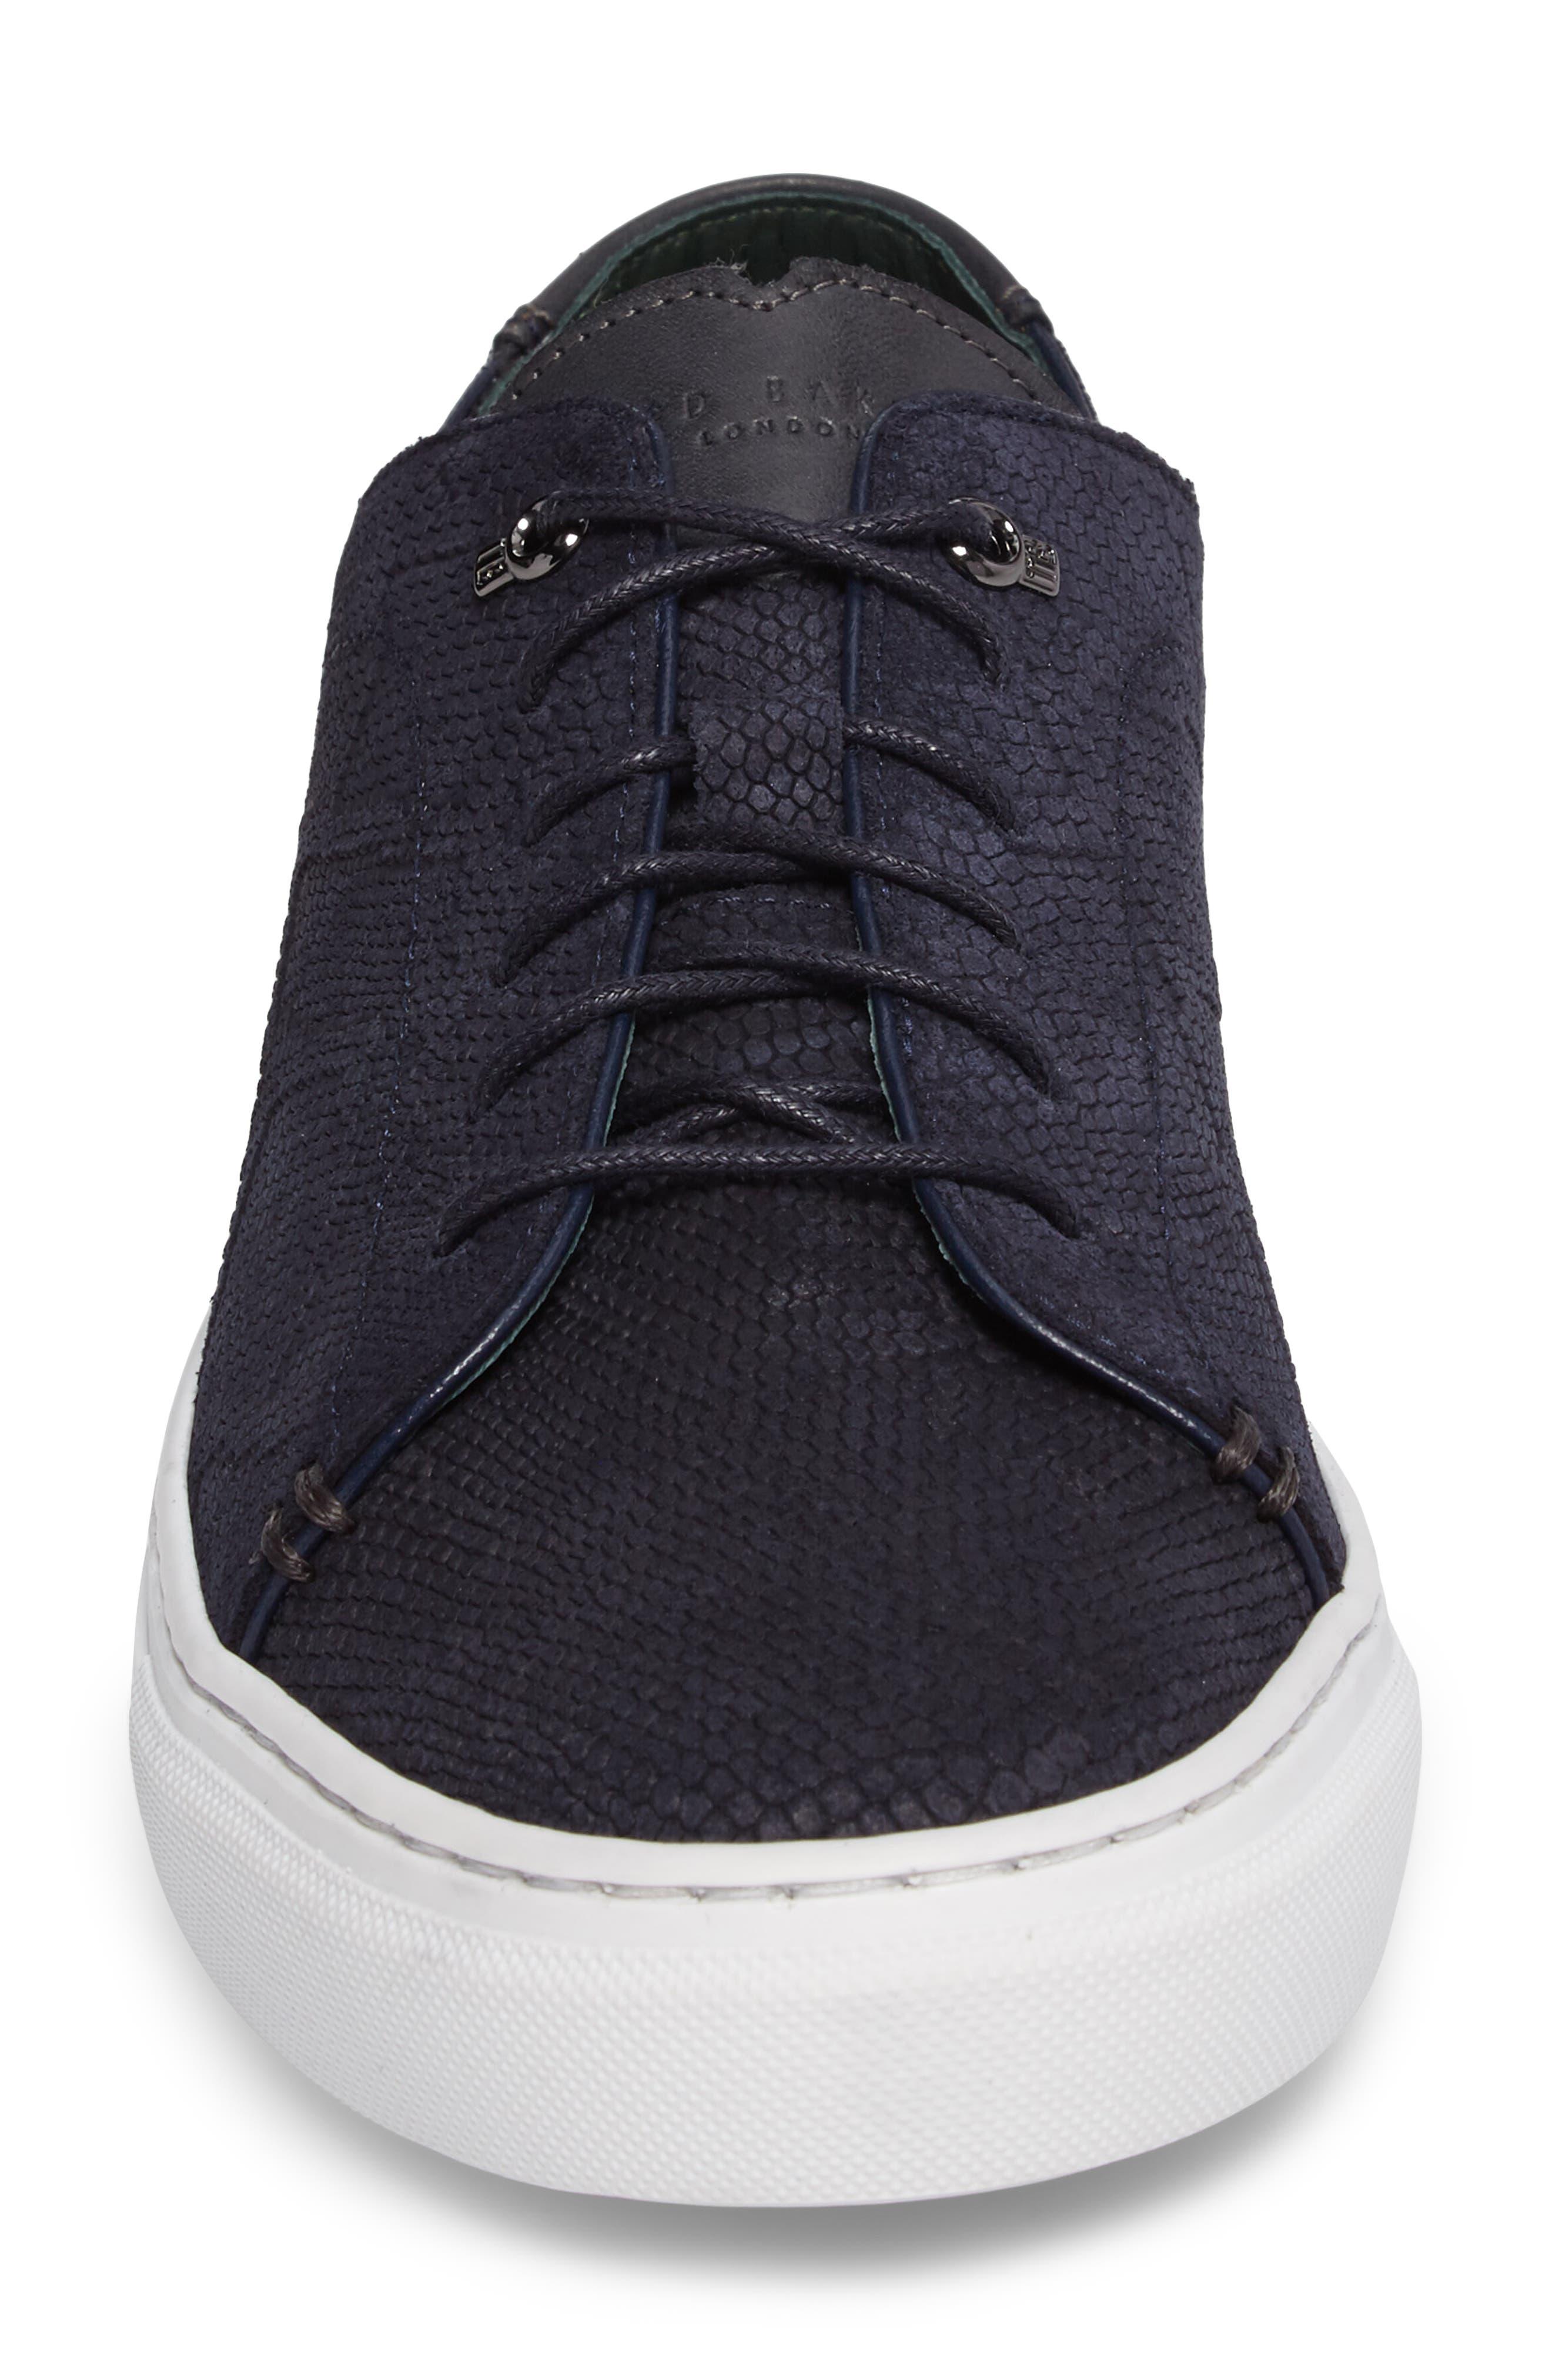 Duuke Sneaker,                             Alternate thumbnail 4, color,                             Dark Blue Suede